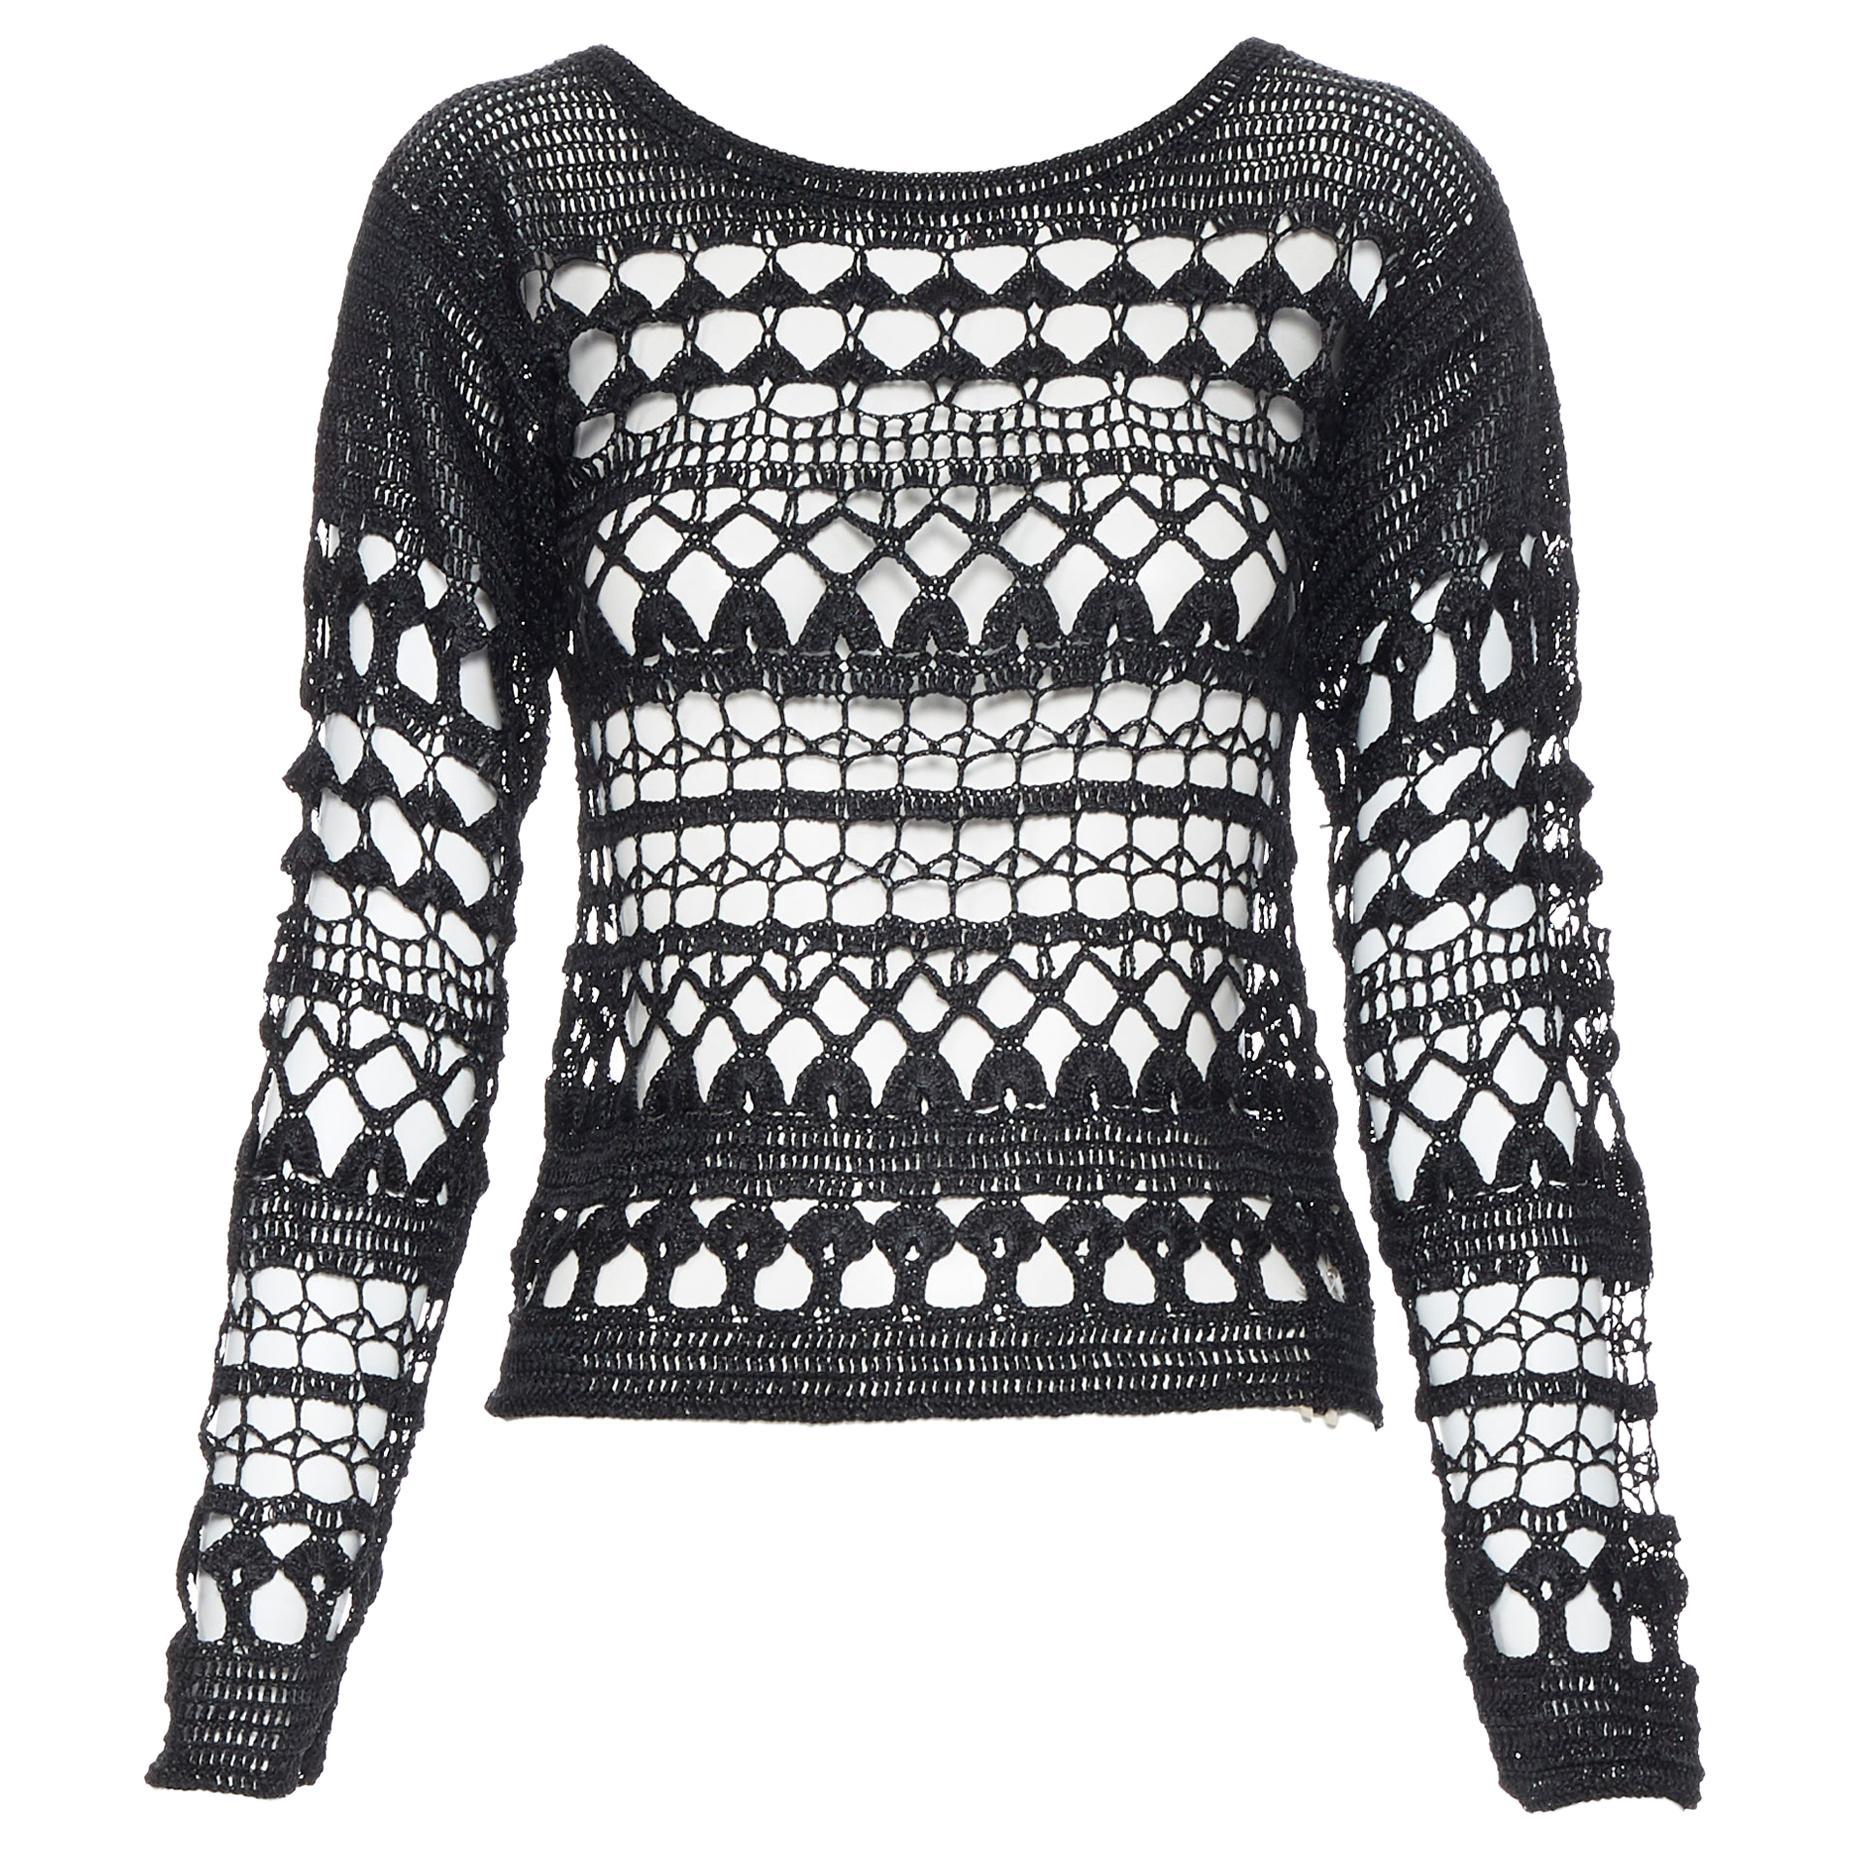 vintage COMME DES GARCONS 1989 black acrylic holey crochet open knit sweater S